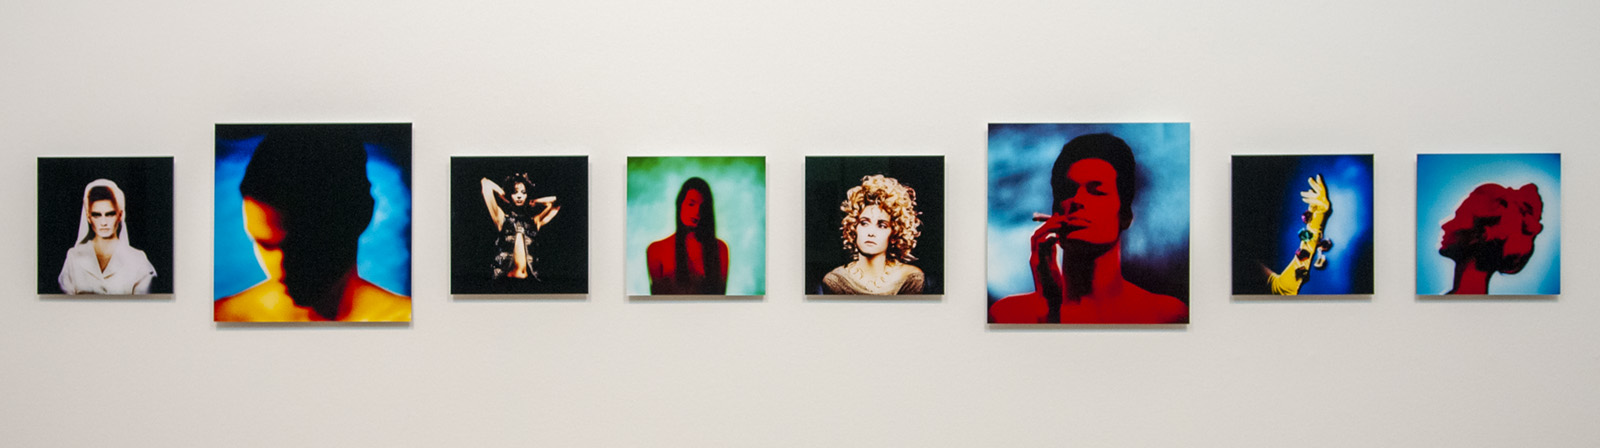 Anton Corbijn, Fotomuseum, The Hague